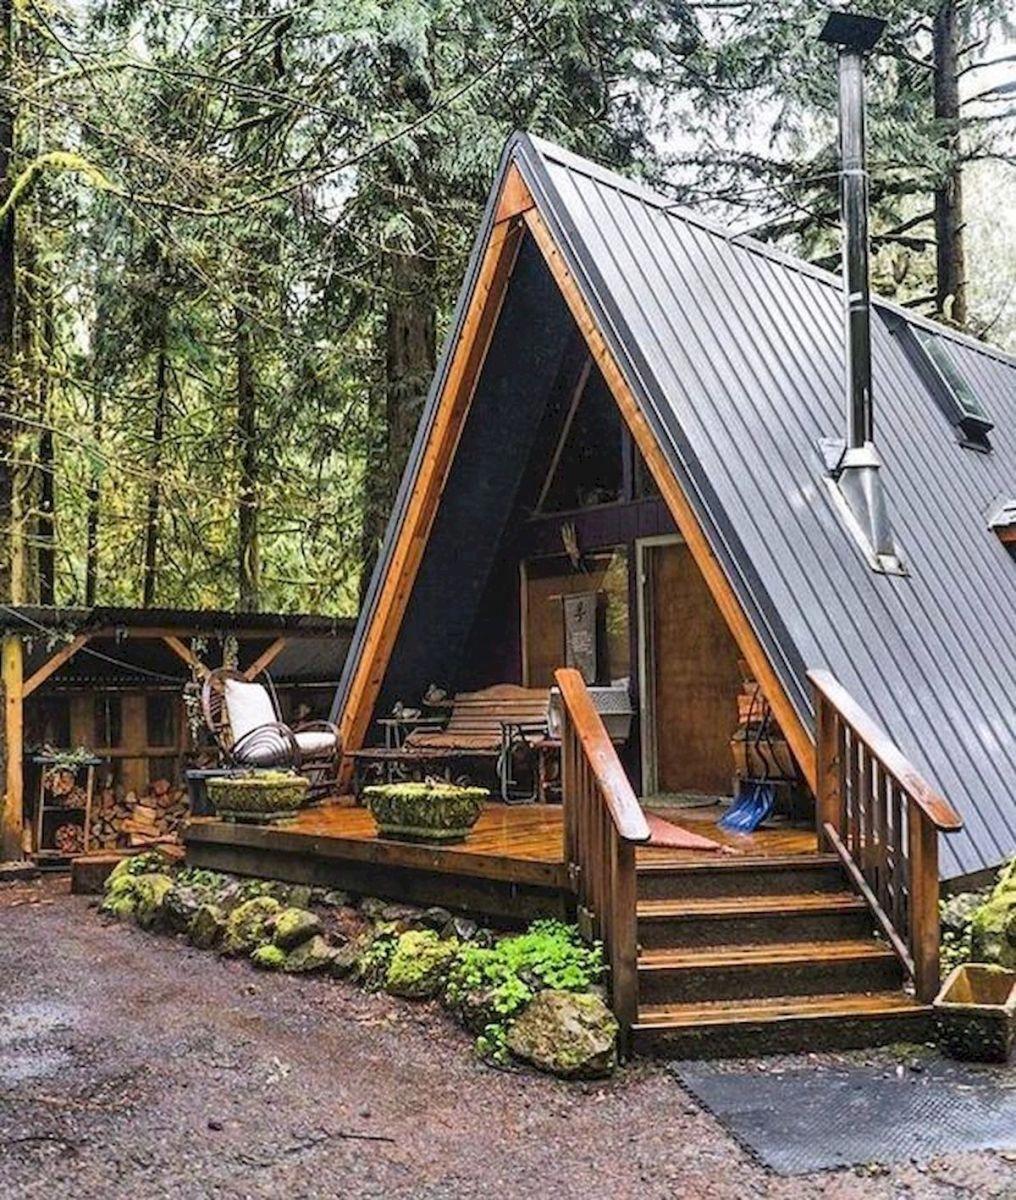 70 Ideias De Design De Casas De Campo De Madeira Pequenas Fantasticas 21 Aframeinterior In 2020 Building A Tiny House Small Log Cabin Log Cabin Homes